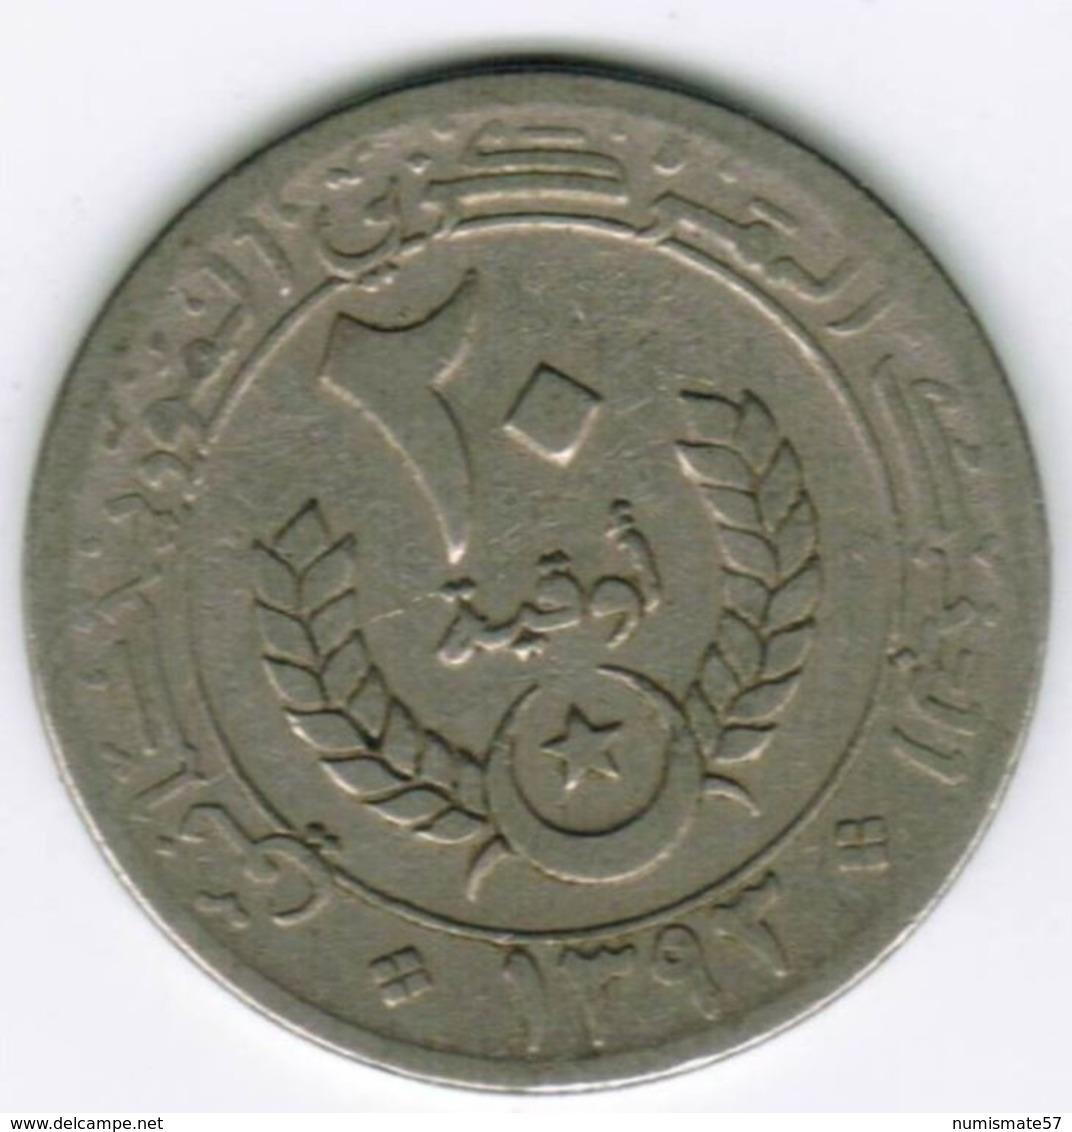 MAURITANIE - 20 OUGUIYA 1973 - Mauritania